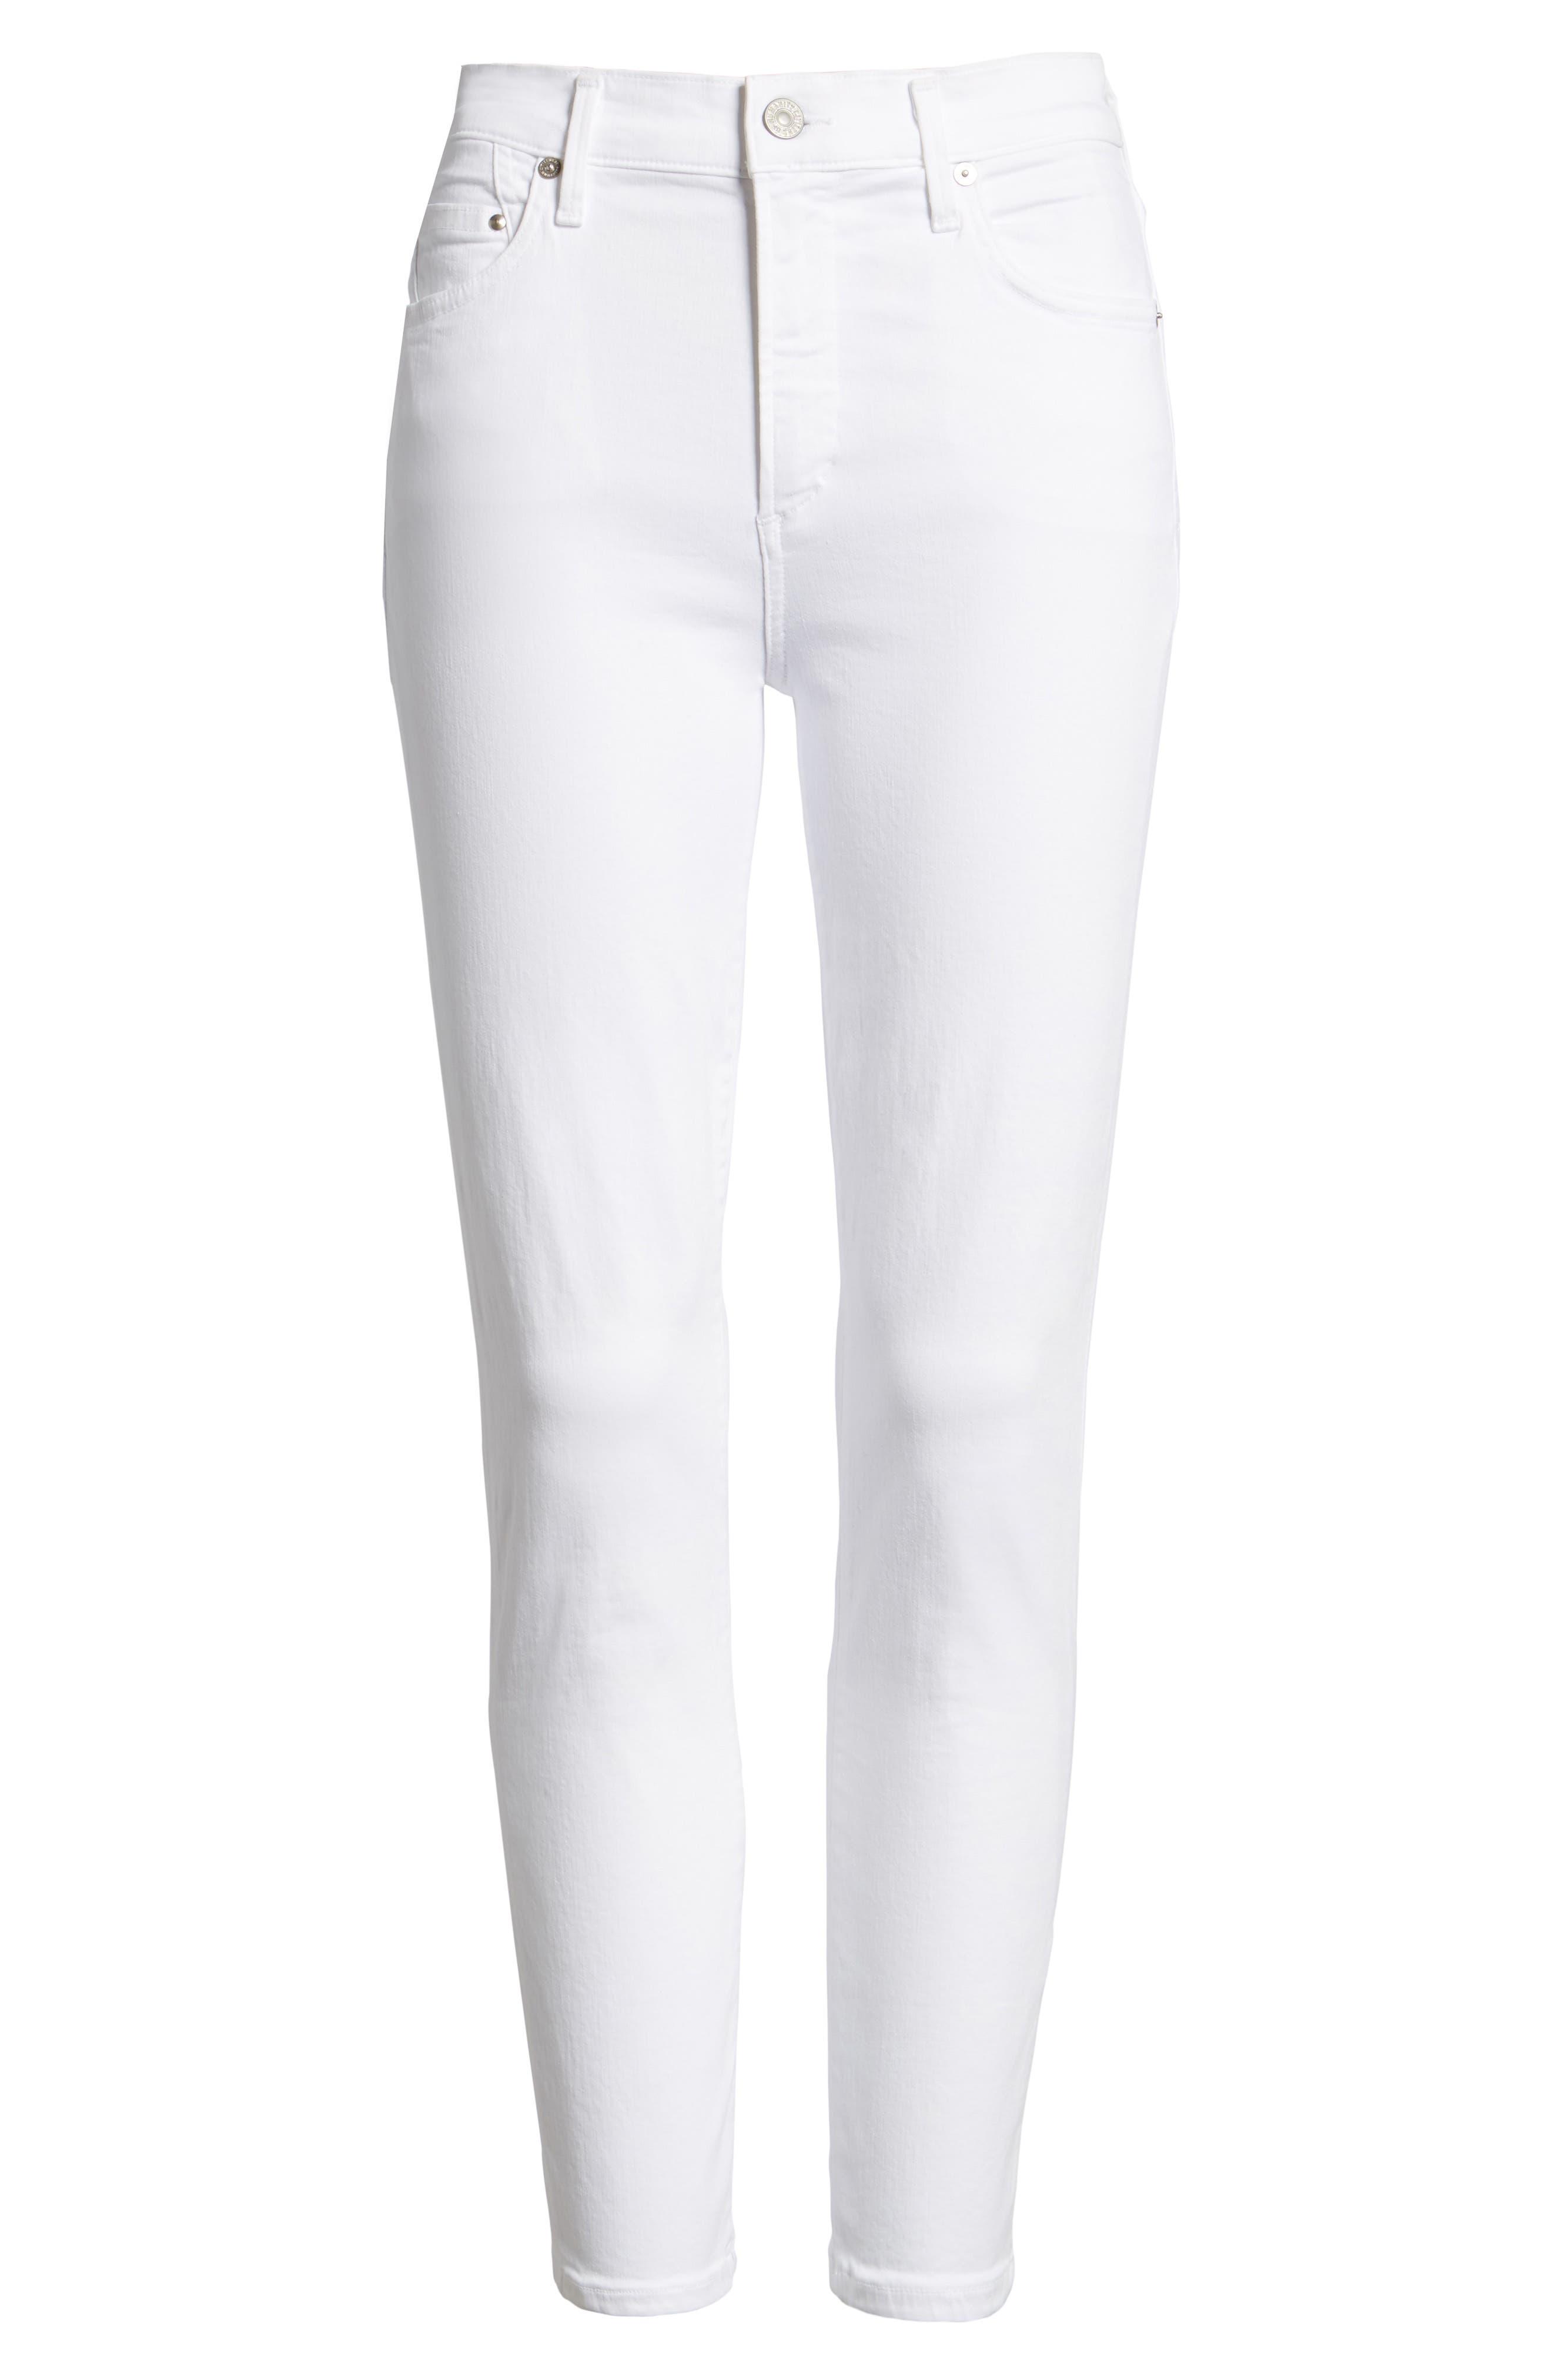 Rocket High Waist Crop Skinny Jeans,                         Main,                         color, 127